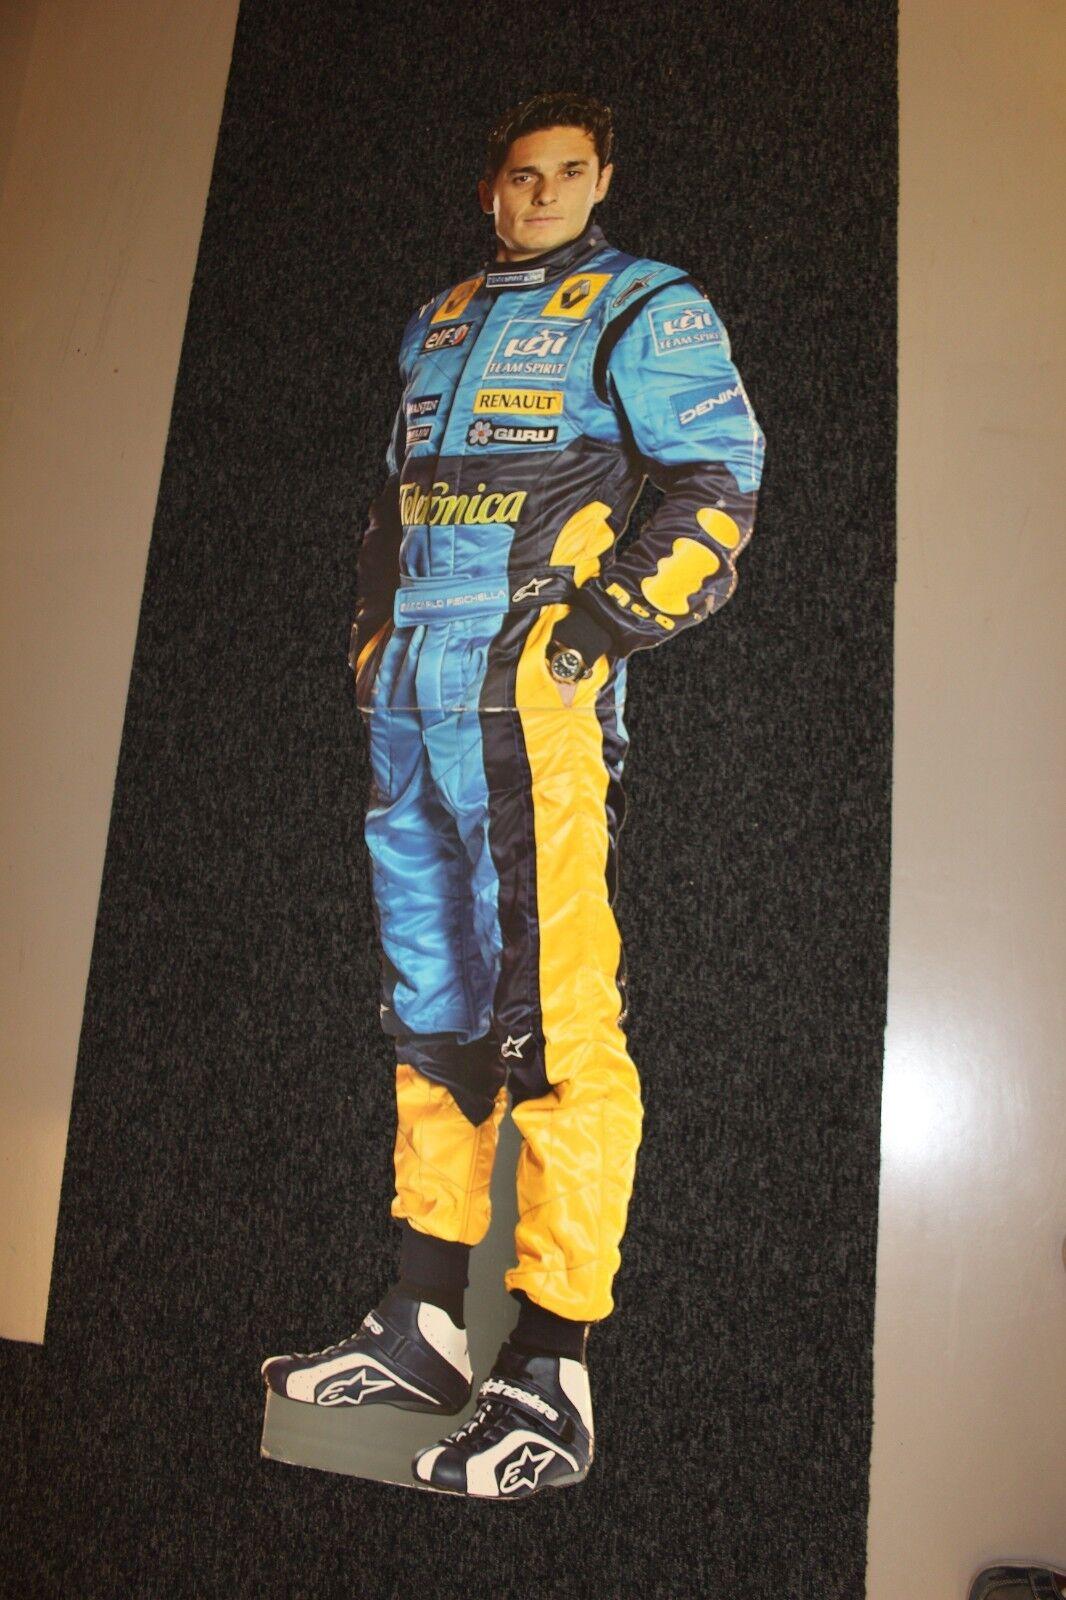 Cardboard Figurine Giancarlo Fisichella Mild Seven Renault F1 (height 178 cm)